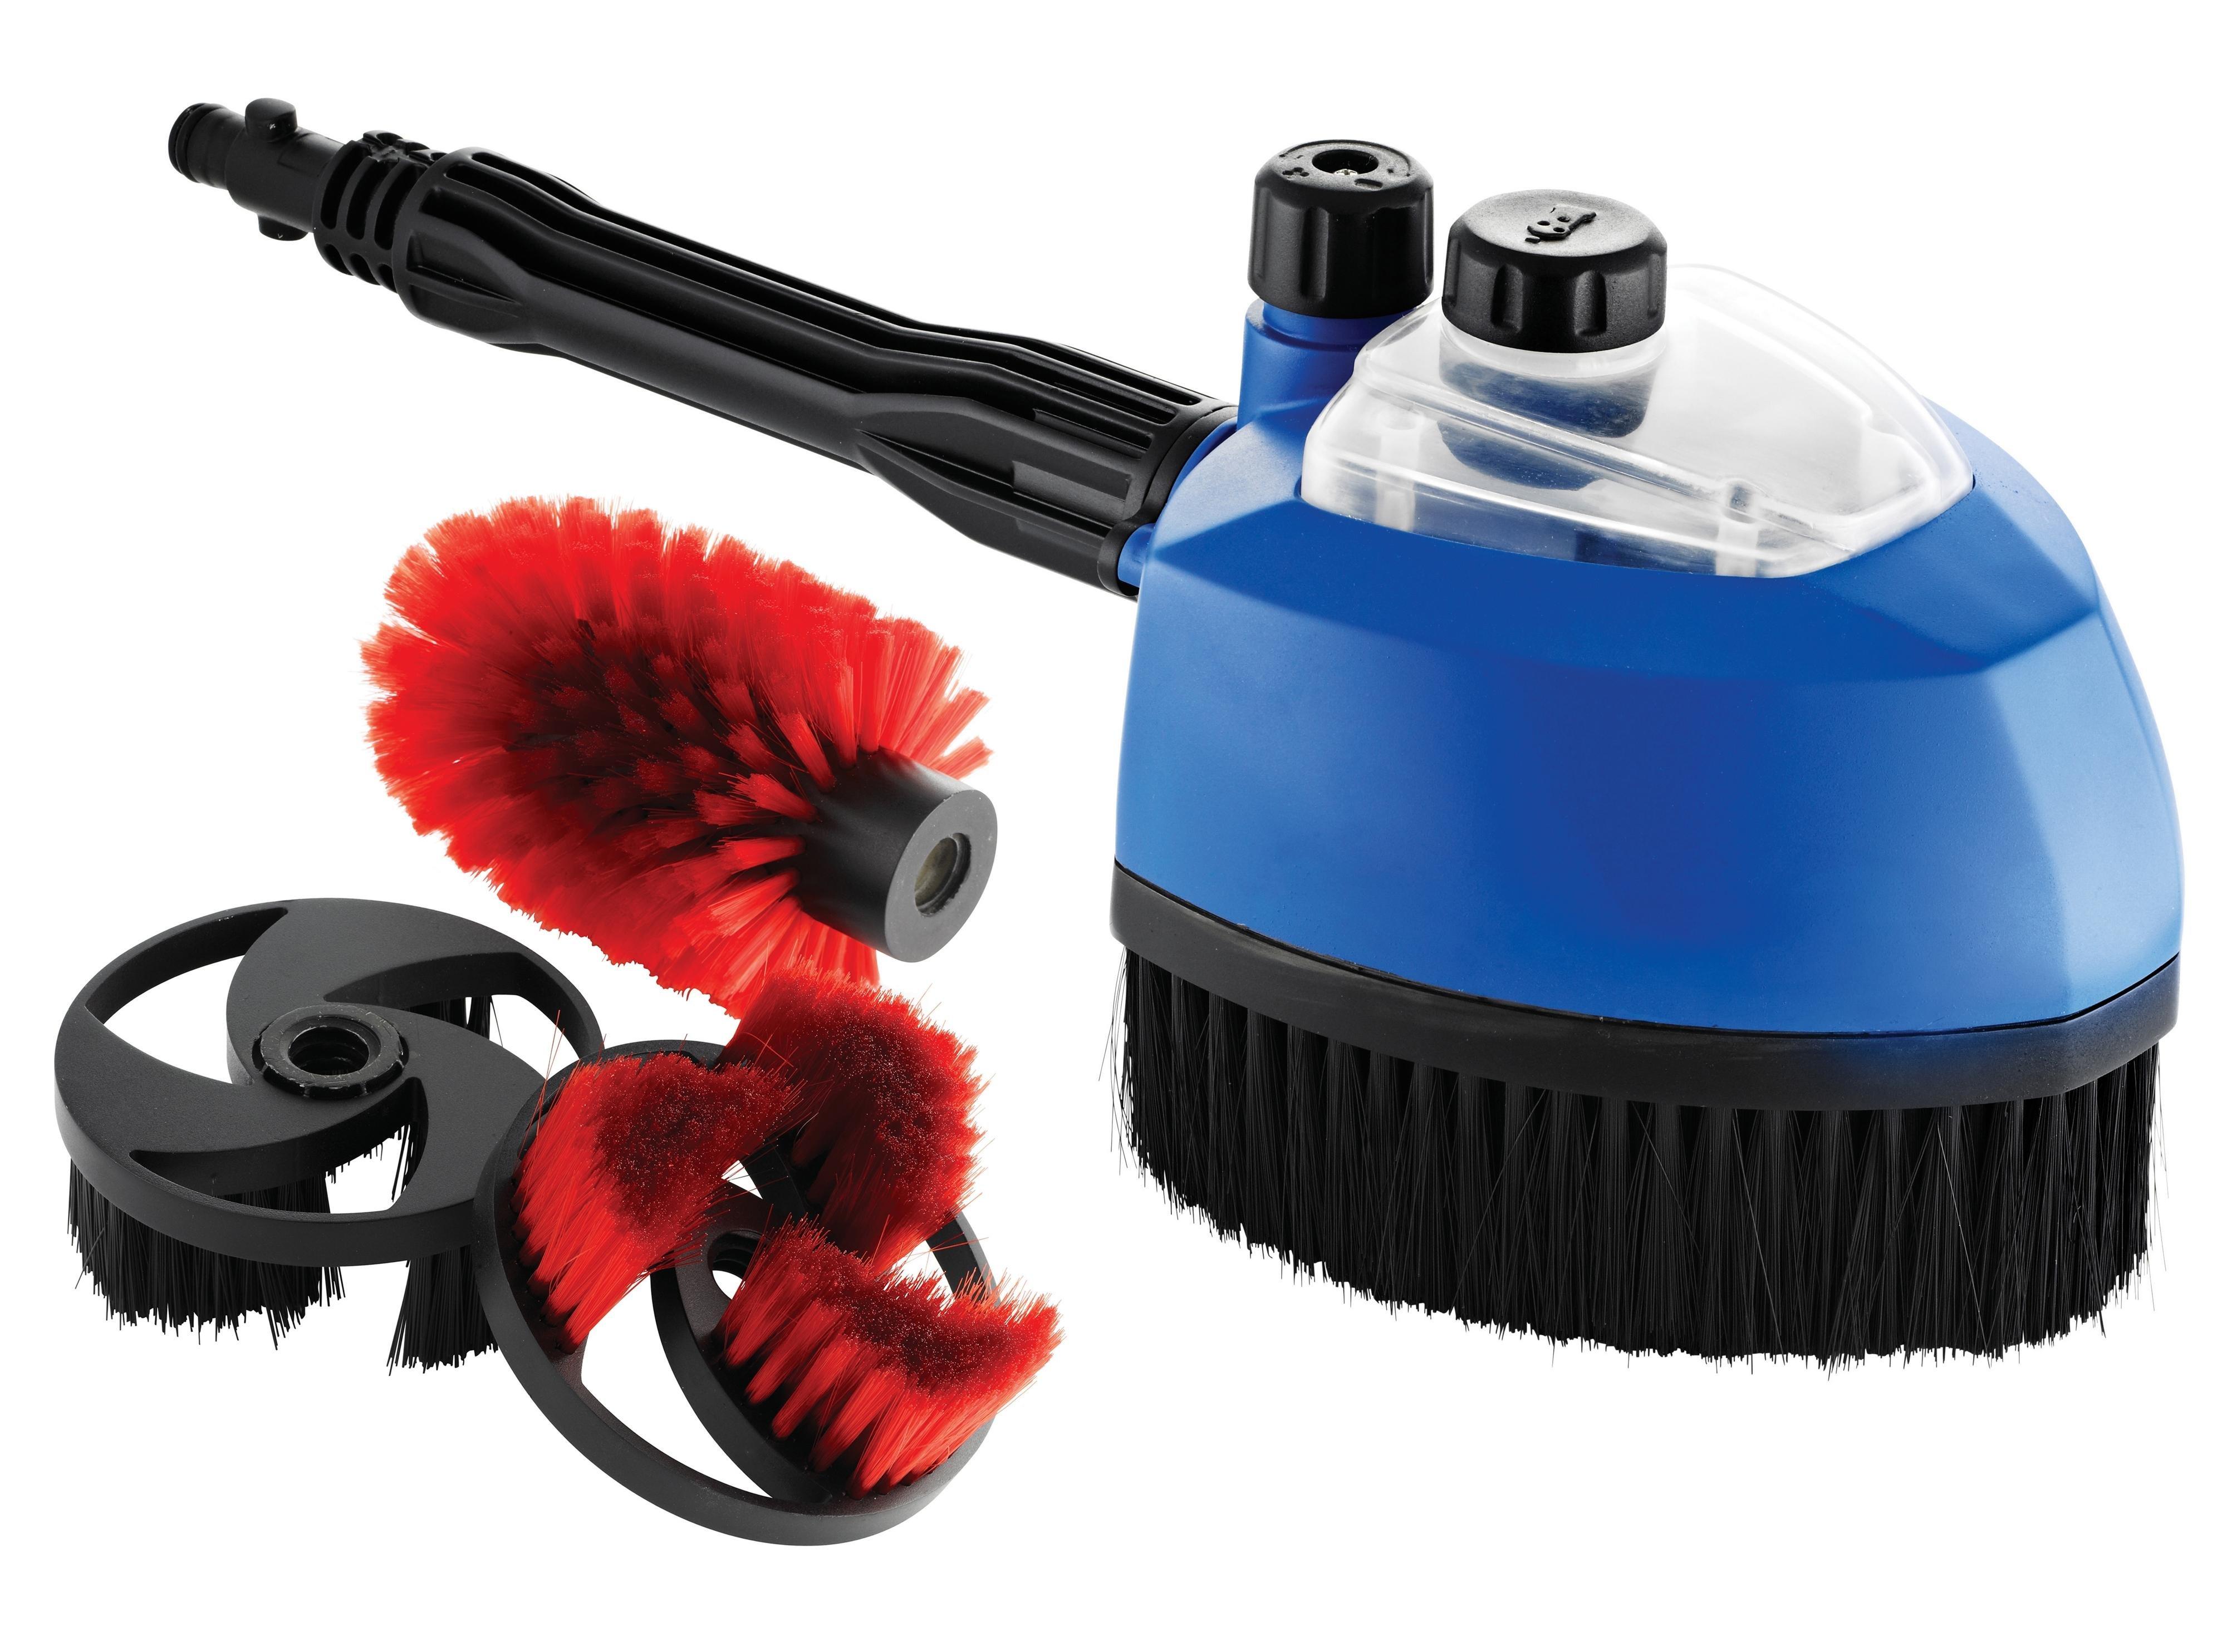 Nilfisk - Rotating Car, Wheel and Garden Brush Kit lowest price